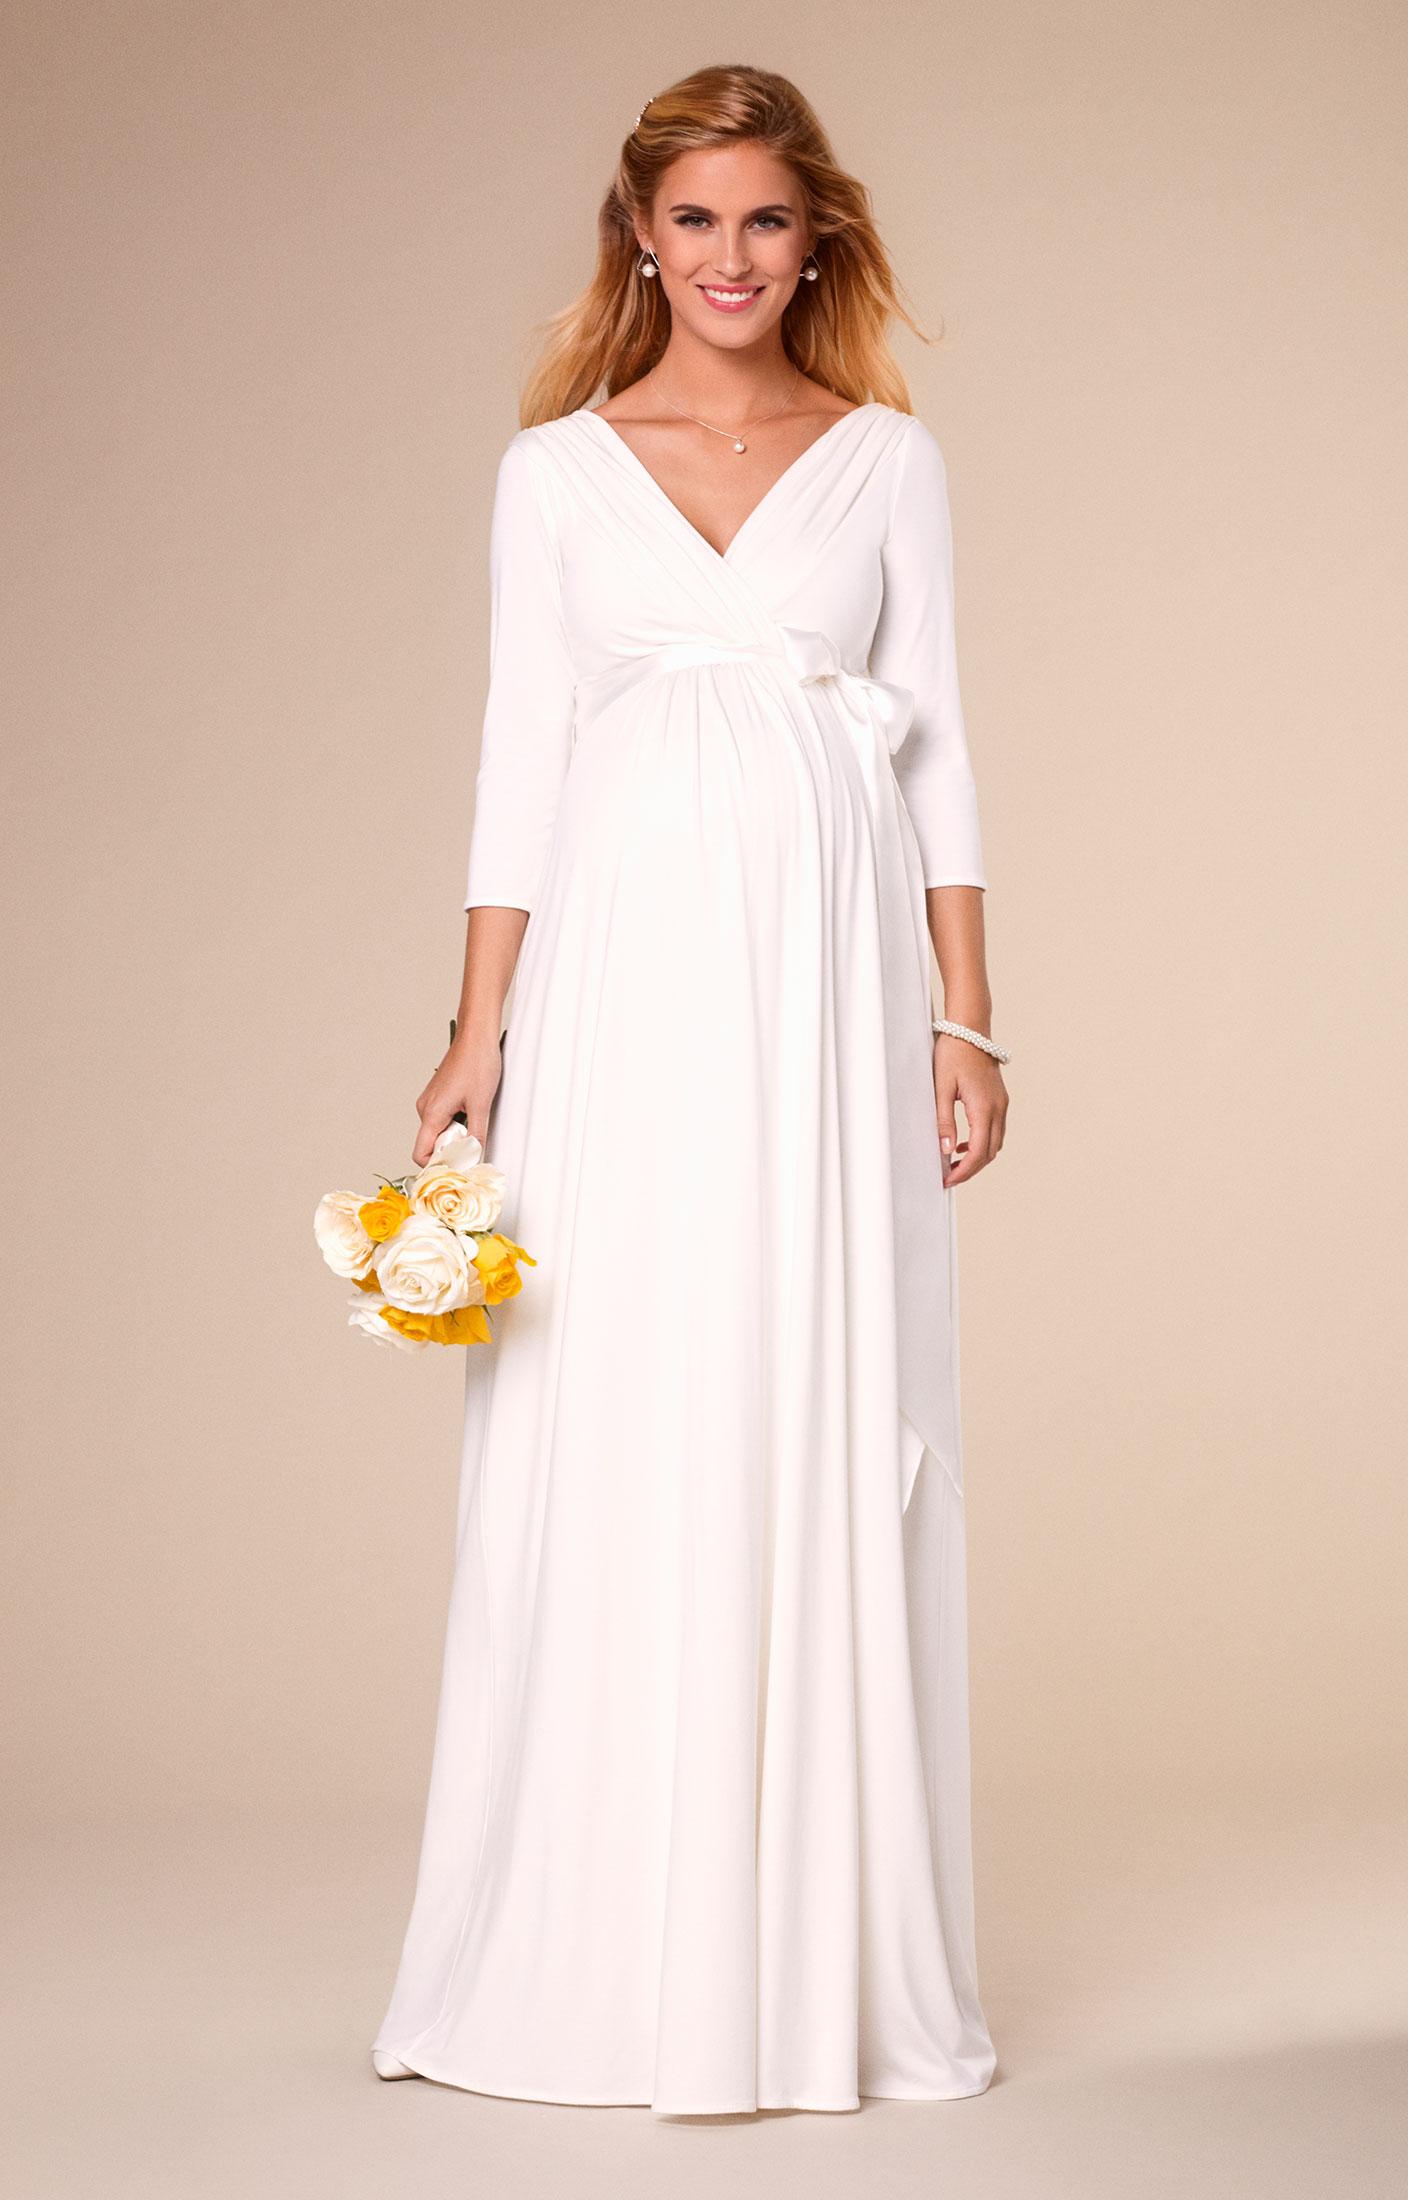 maternity dresses for summer wedding photo - 1